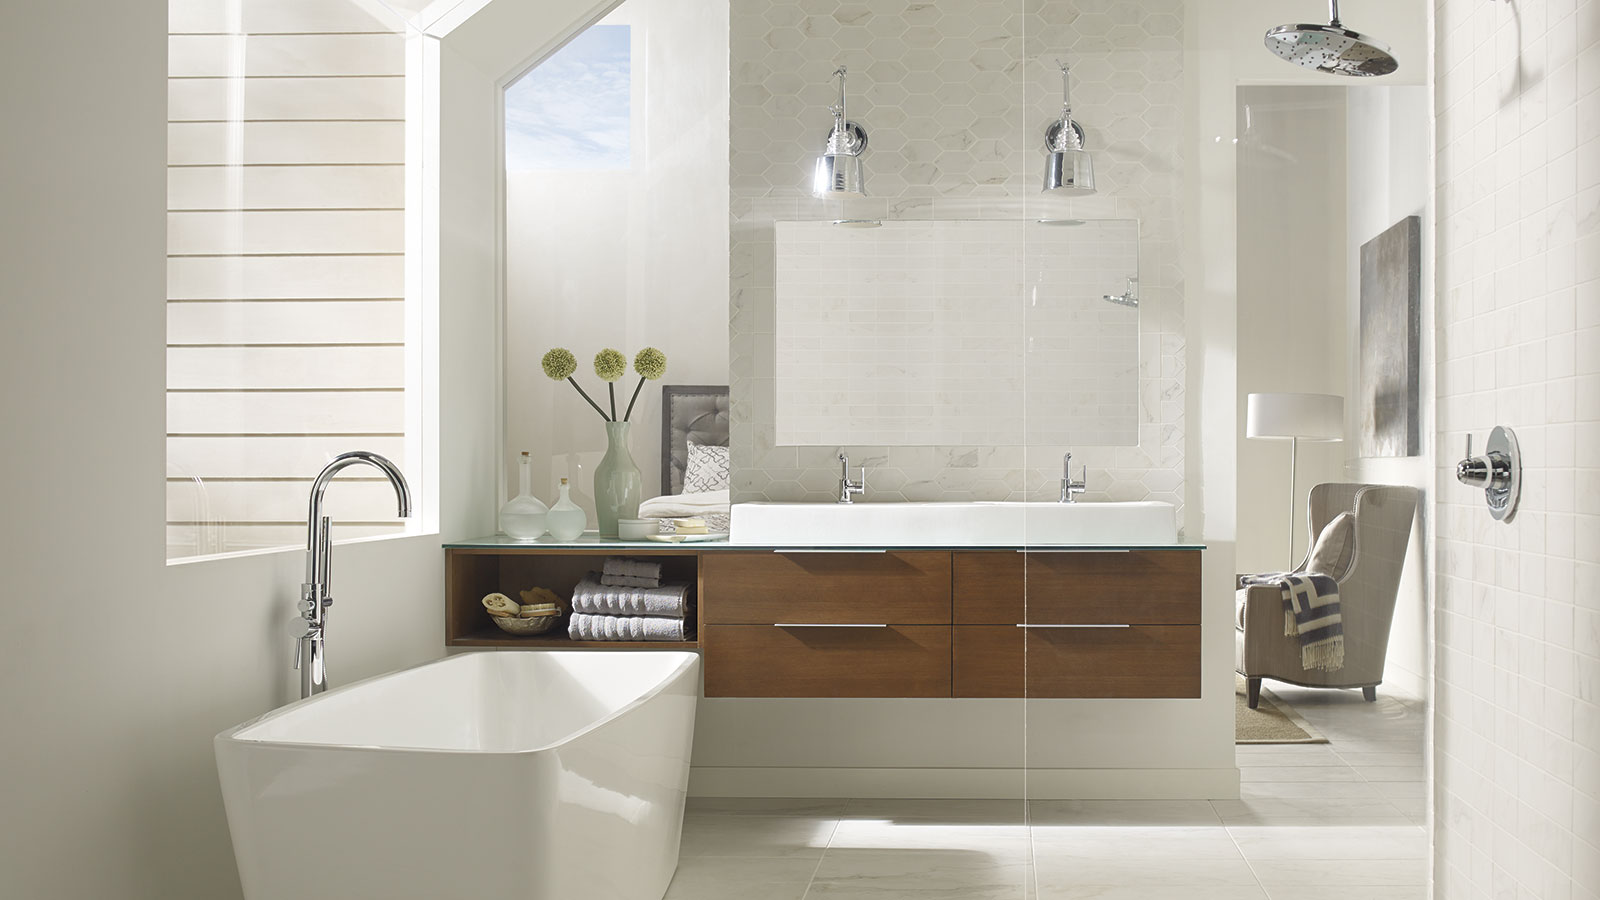 WallHung Vanity Cabinet Omega Cabinetry - Wall hung vanity cabinets